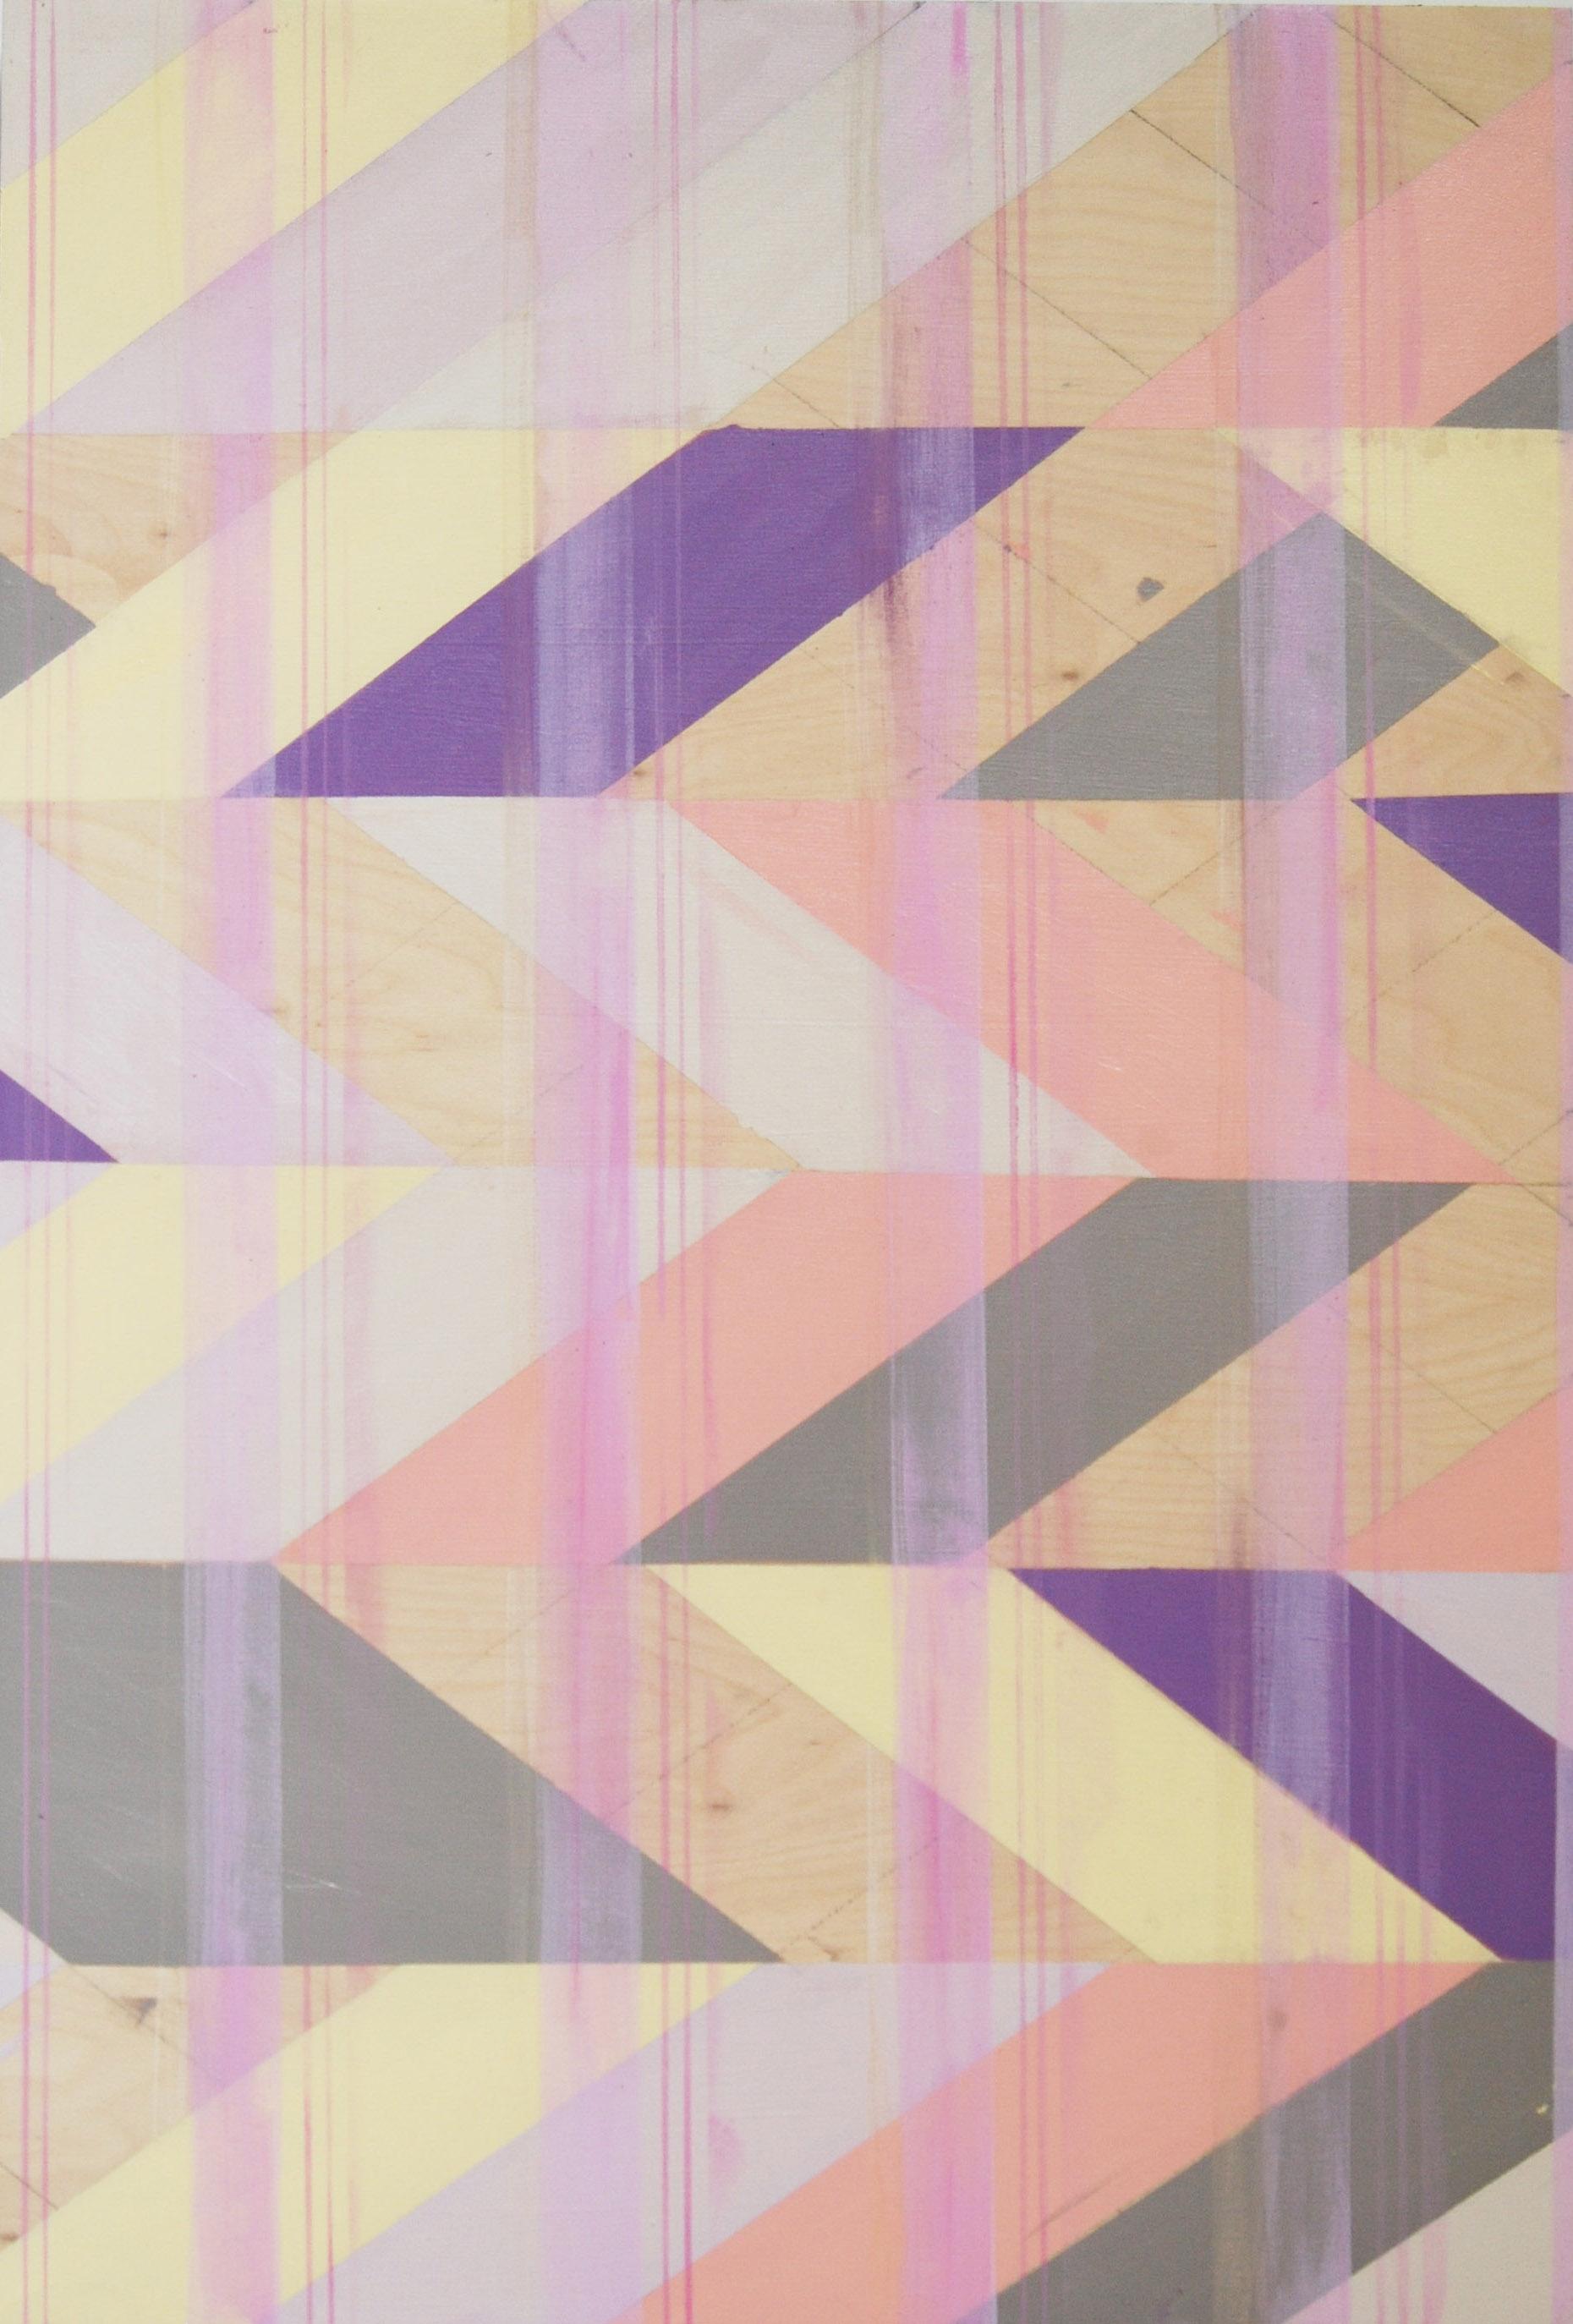 Untitled (Violet II) , oil on board, 48x48, 2012 $700